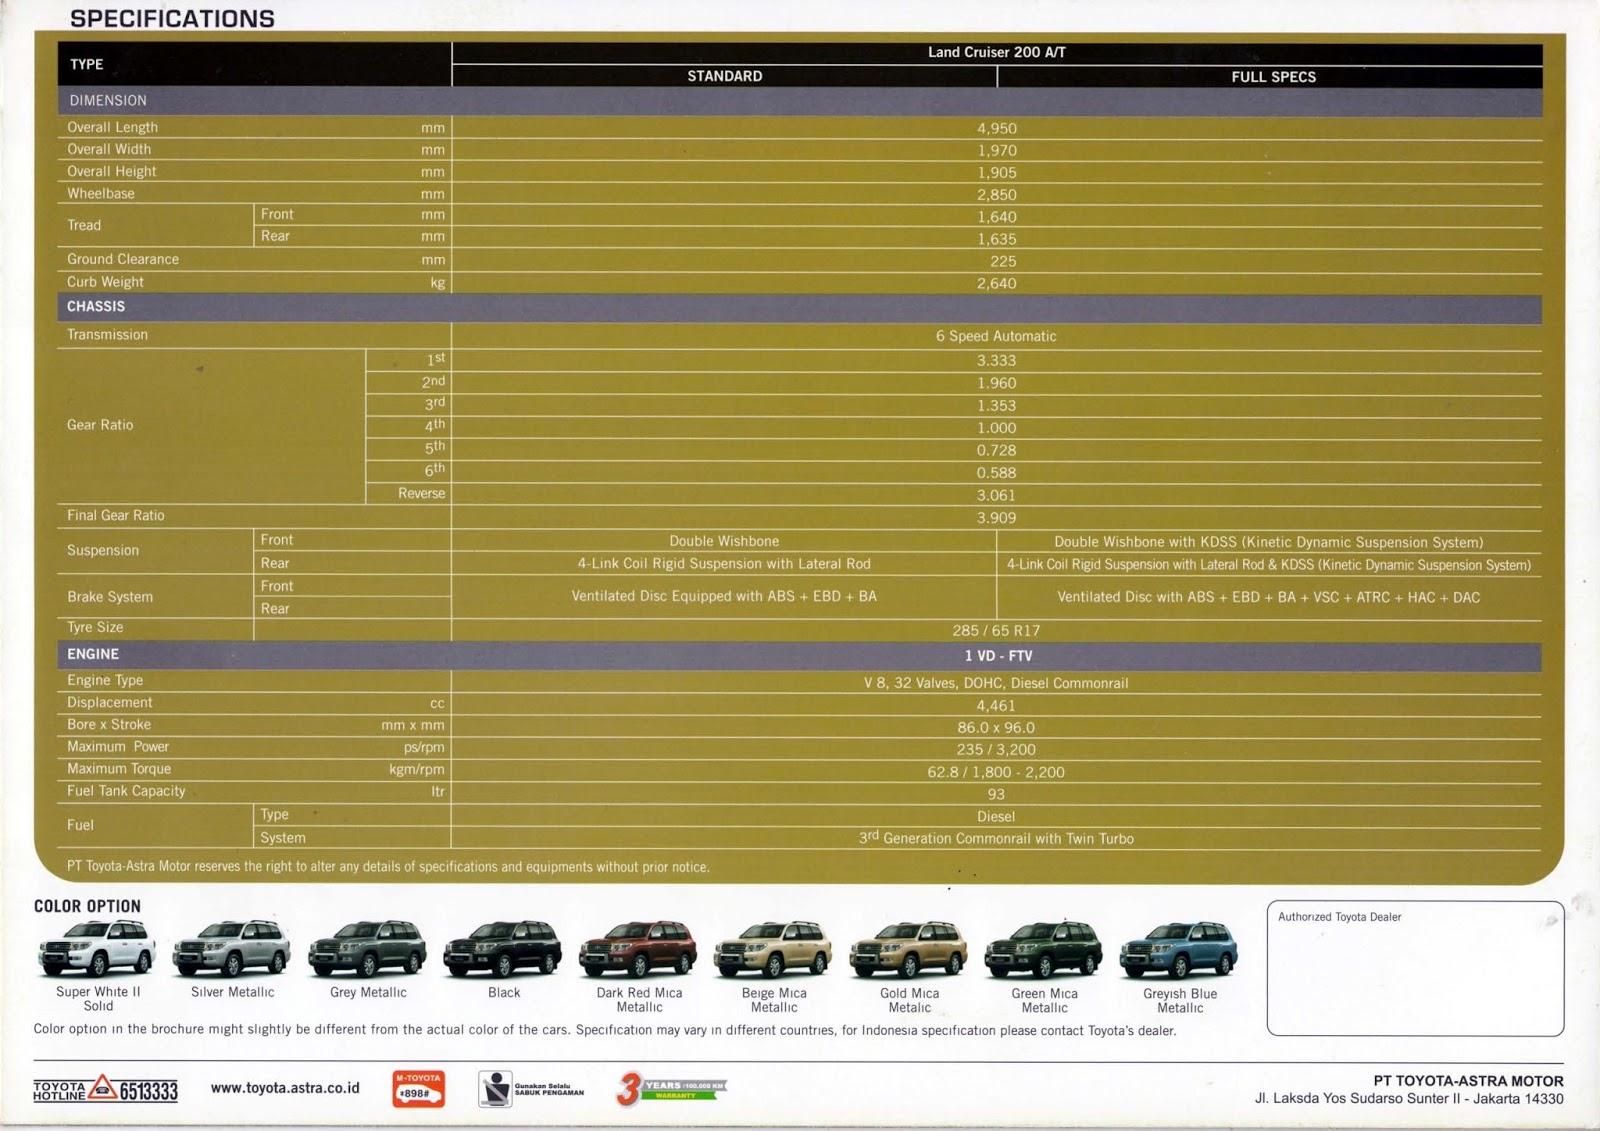 Spesifikasi Grand New Avanza 2015 Tipe G 2017 Brosur Toyota Landcruiser Kediri